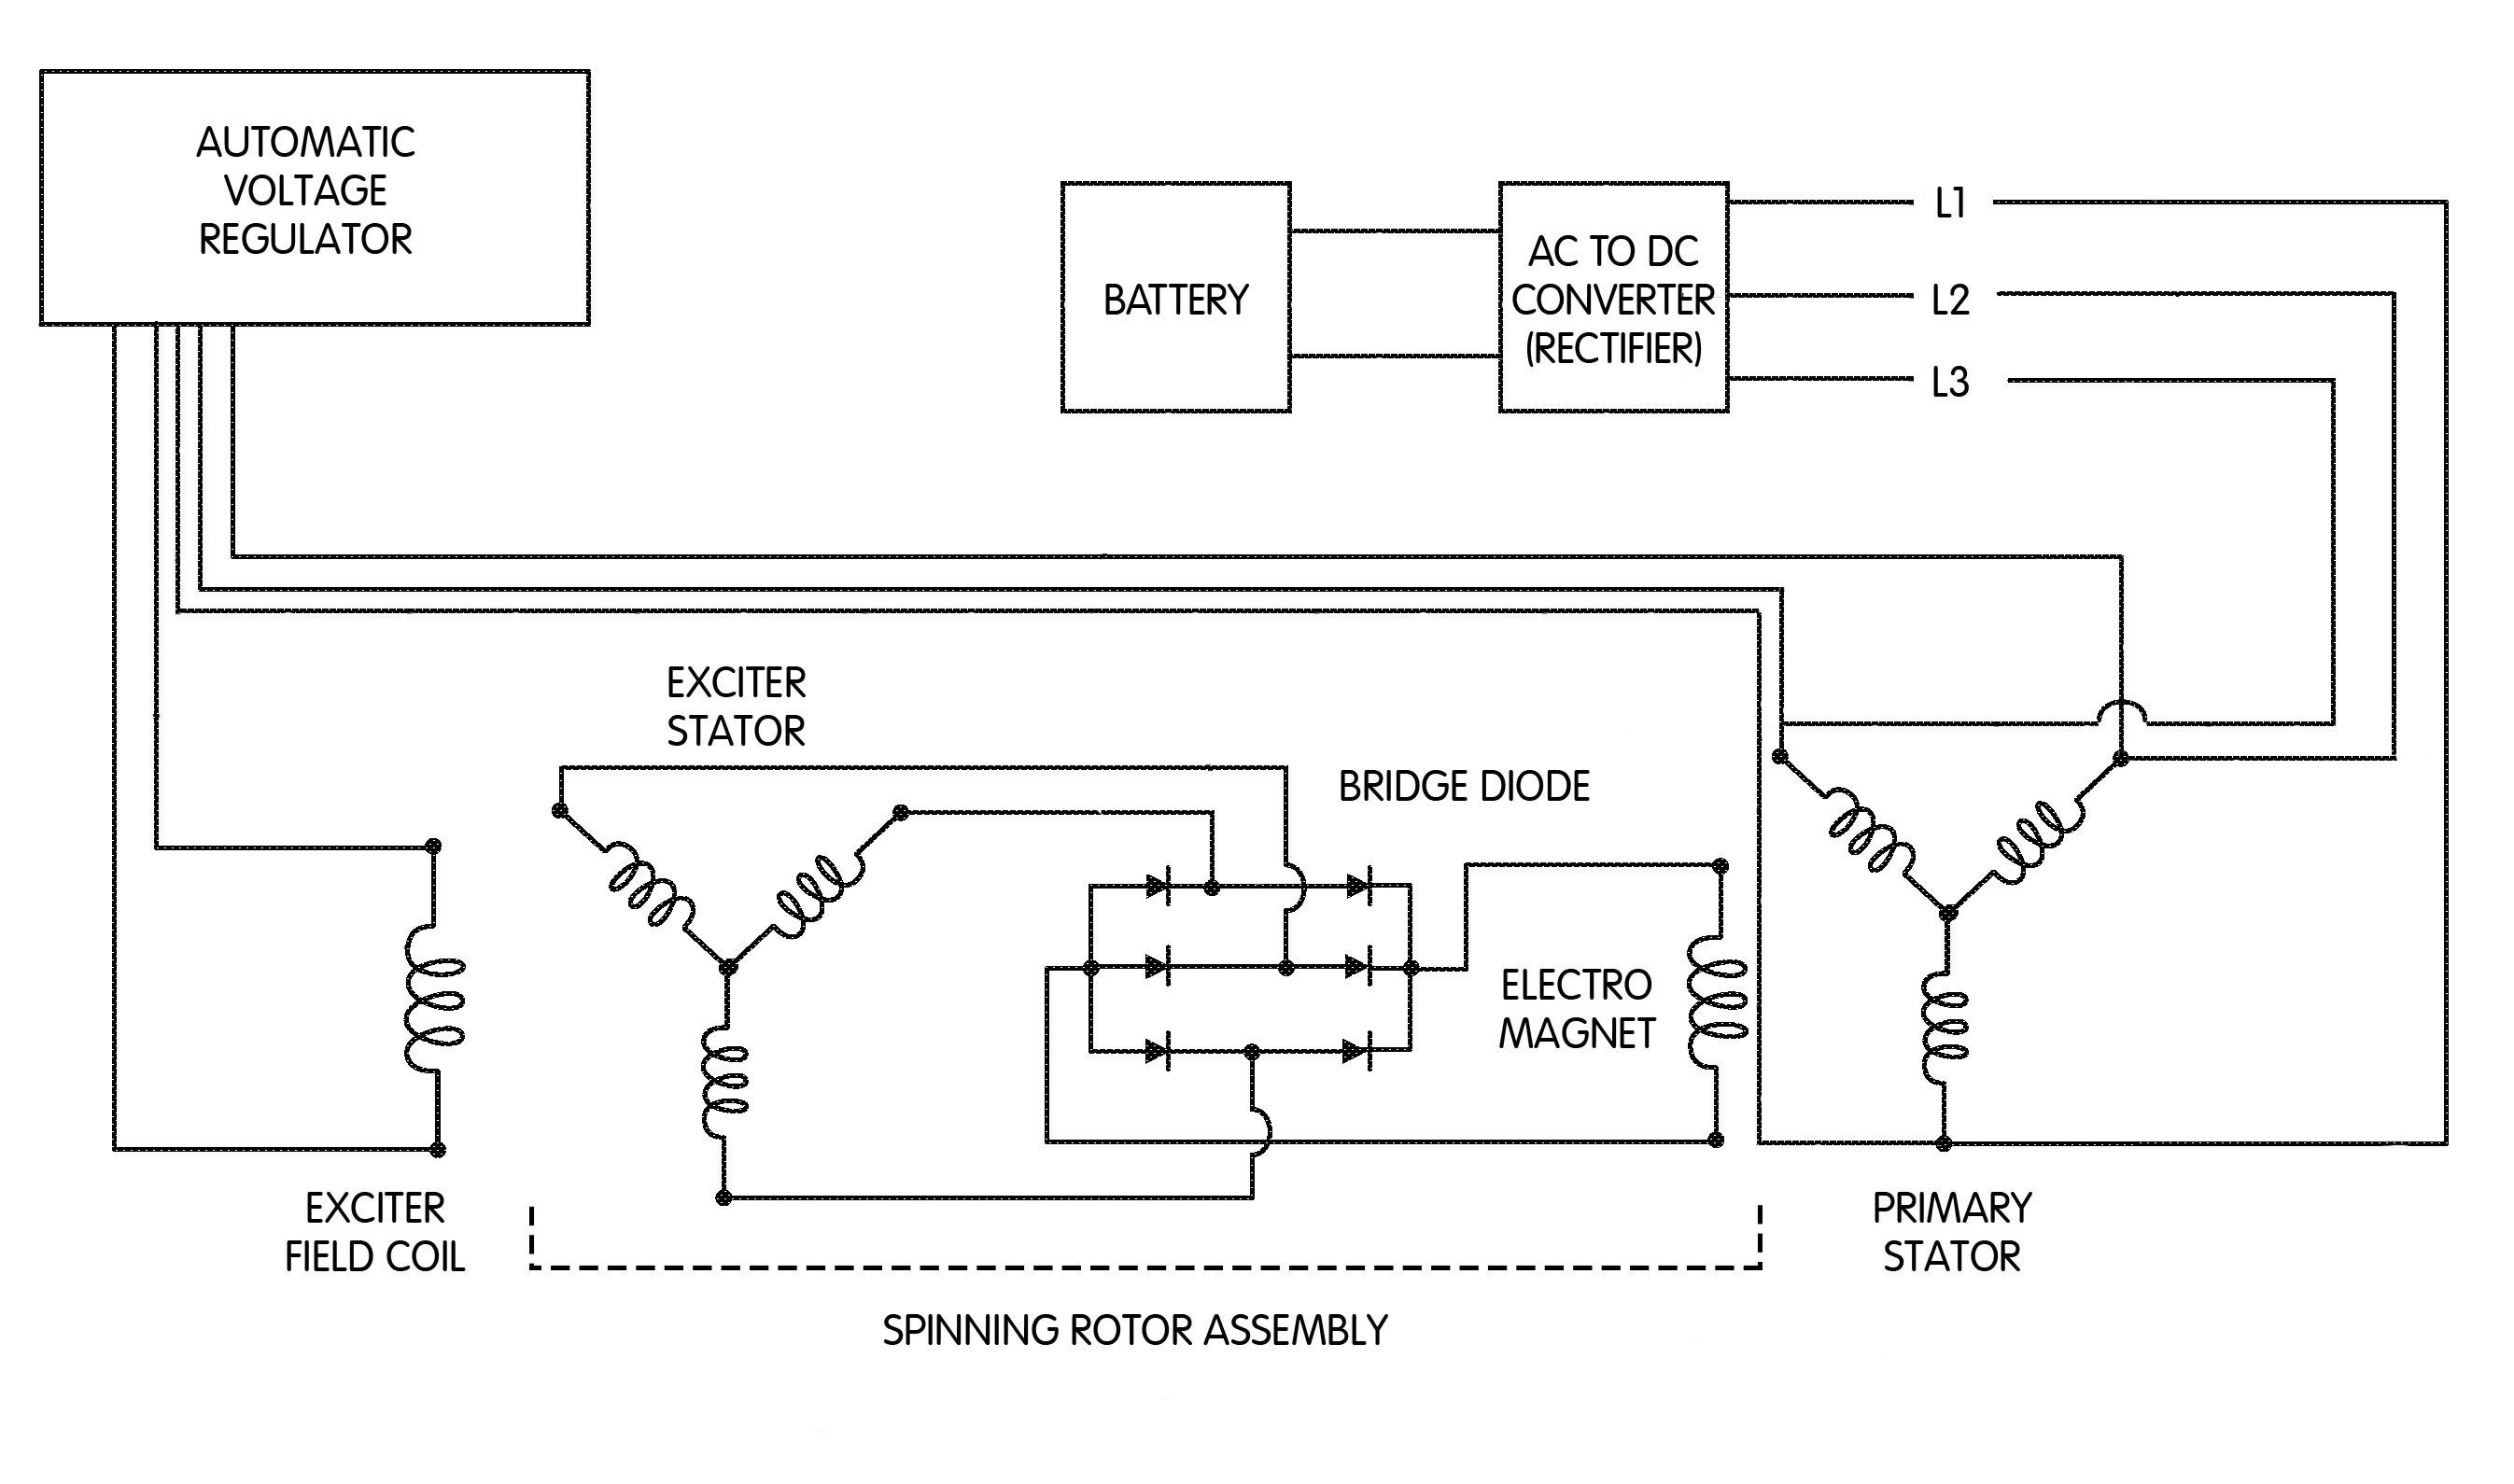 [DIAGRAM_3US]  591 Inspirational Alternator Exciter Wiring Diagram | Wiring ... | Wiring  Library | Alternator Exciter Wiring Diagram |  | Wiring Library